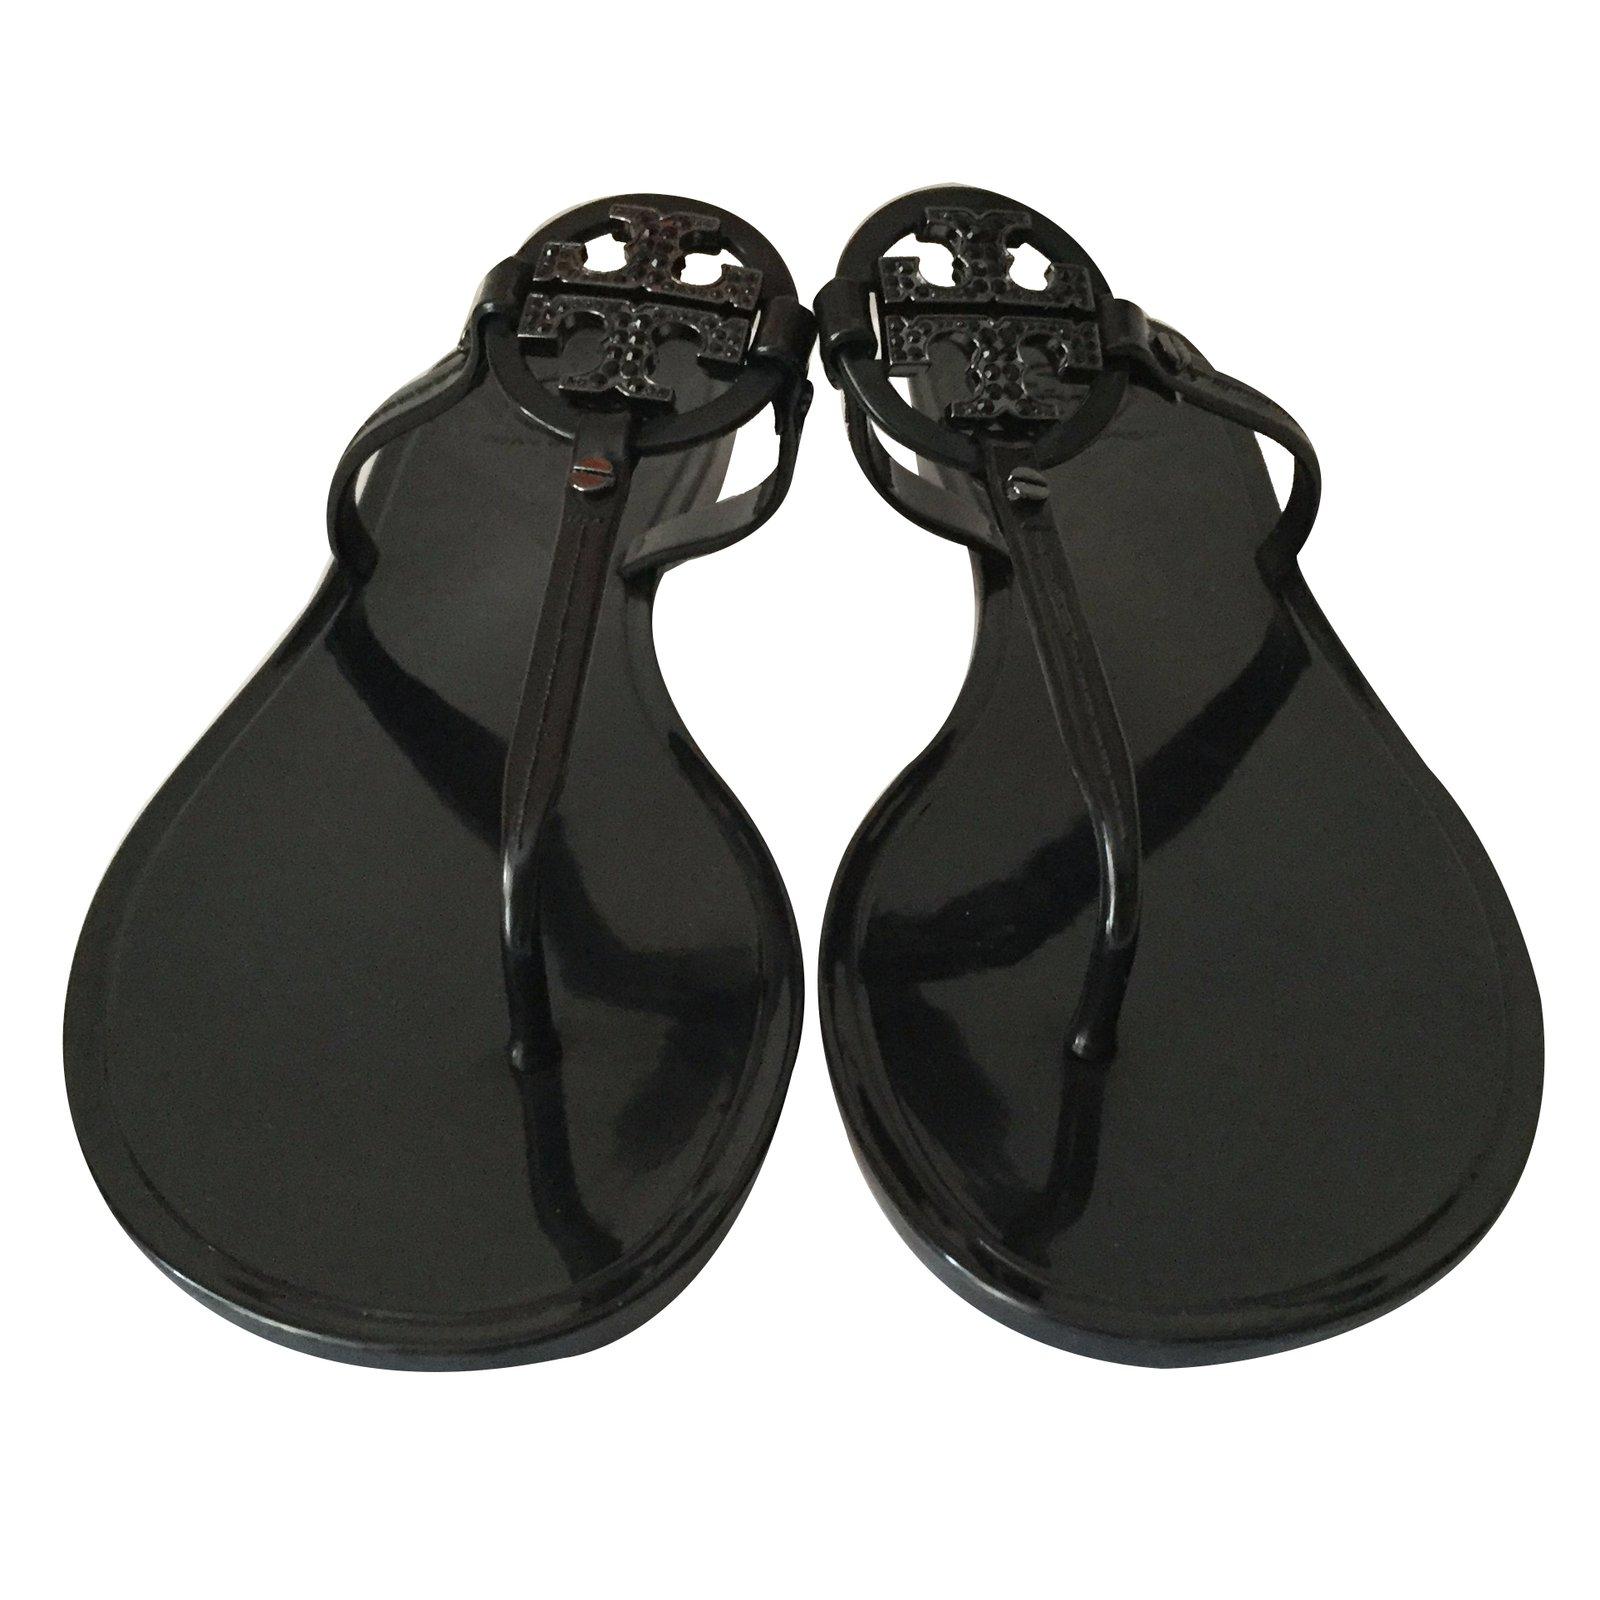 Tory Burch Sandals Sandals Plastic